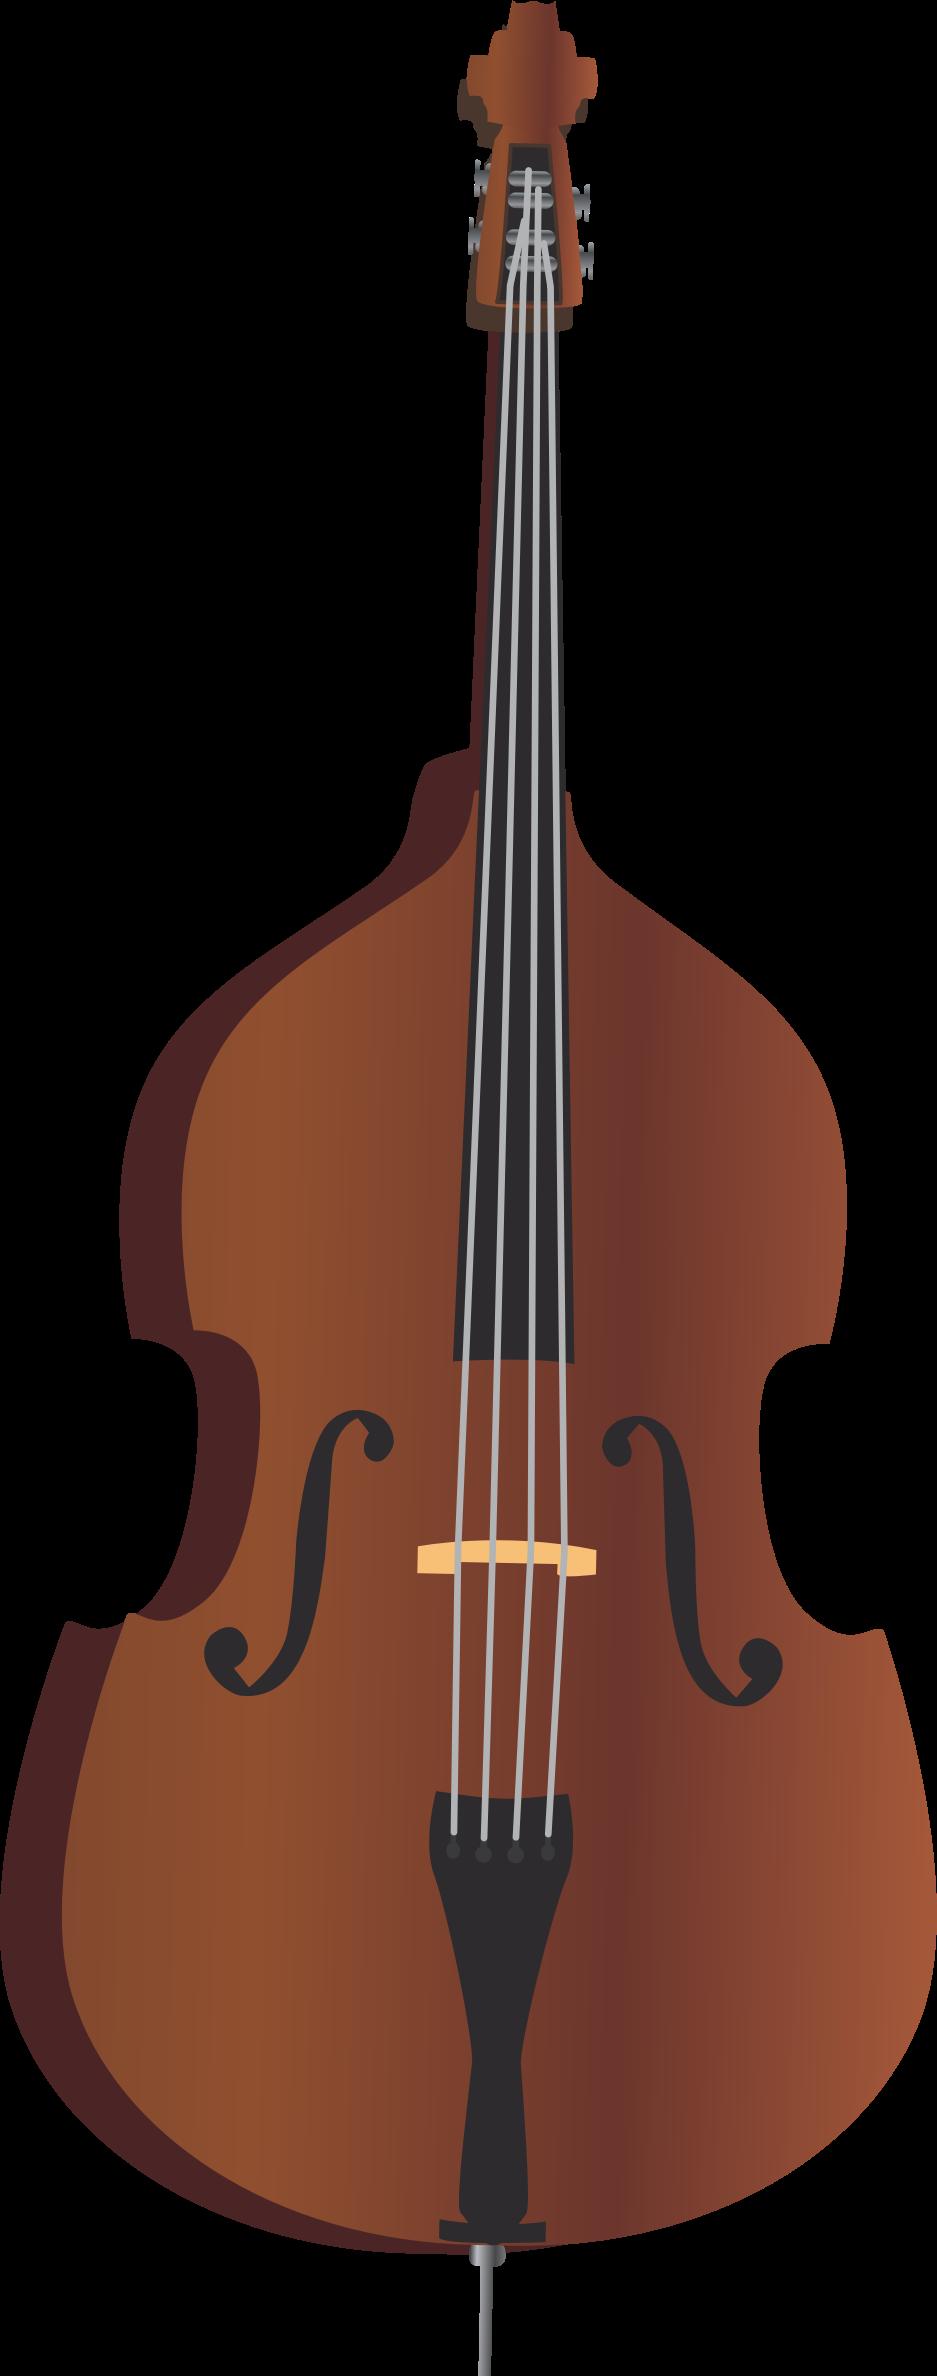 1588 Bass free clipart.